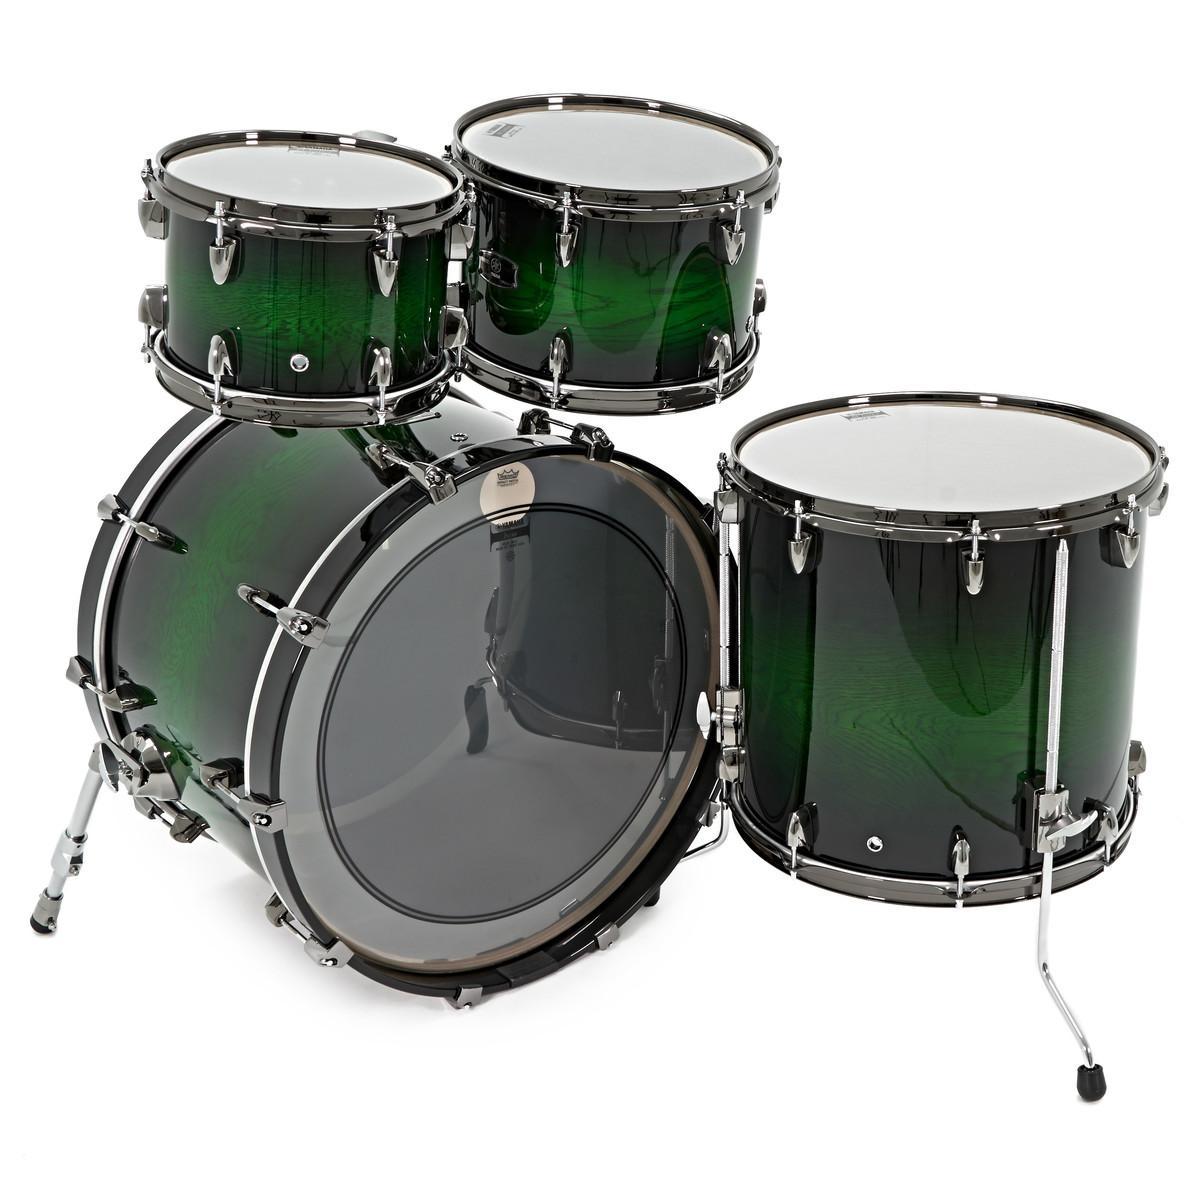 Drum Shell Pack : yamaha live custom shell pack with 18 bass drum various colours available yamaha music london ~ Hamham.info Haus und Dekorationen